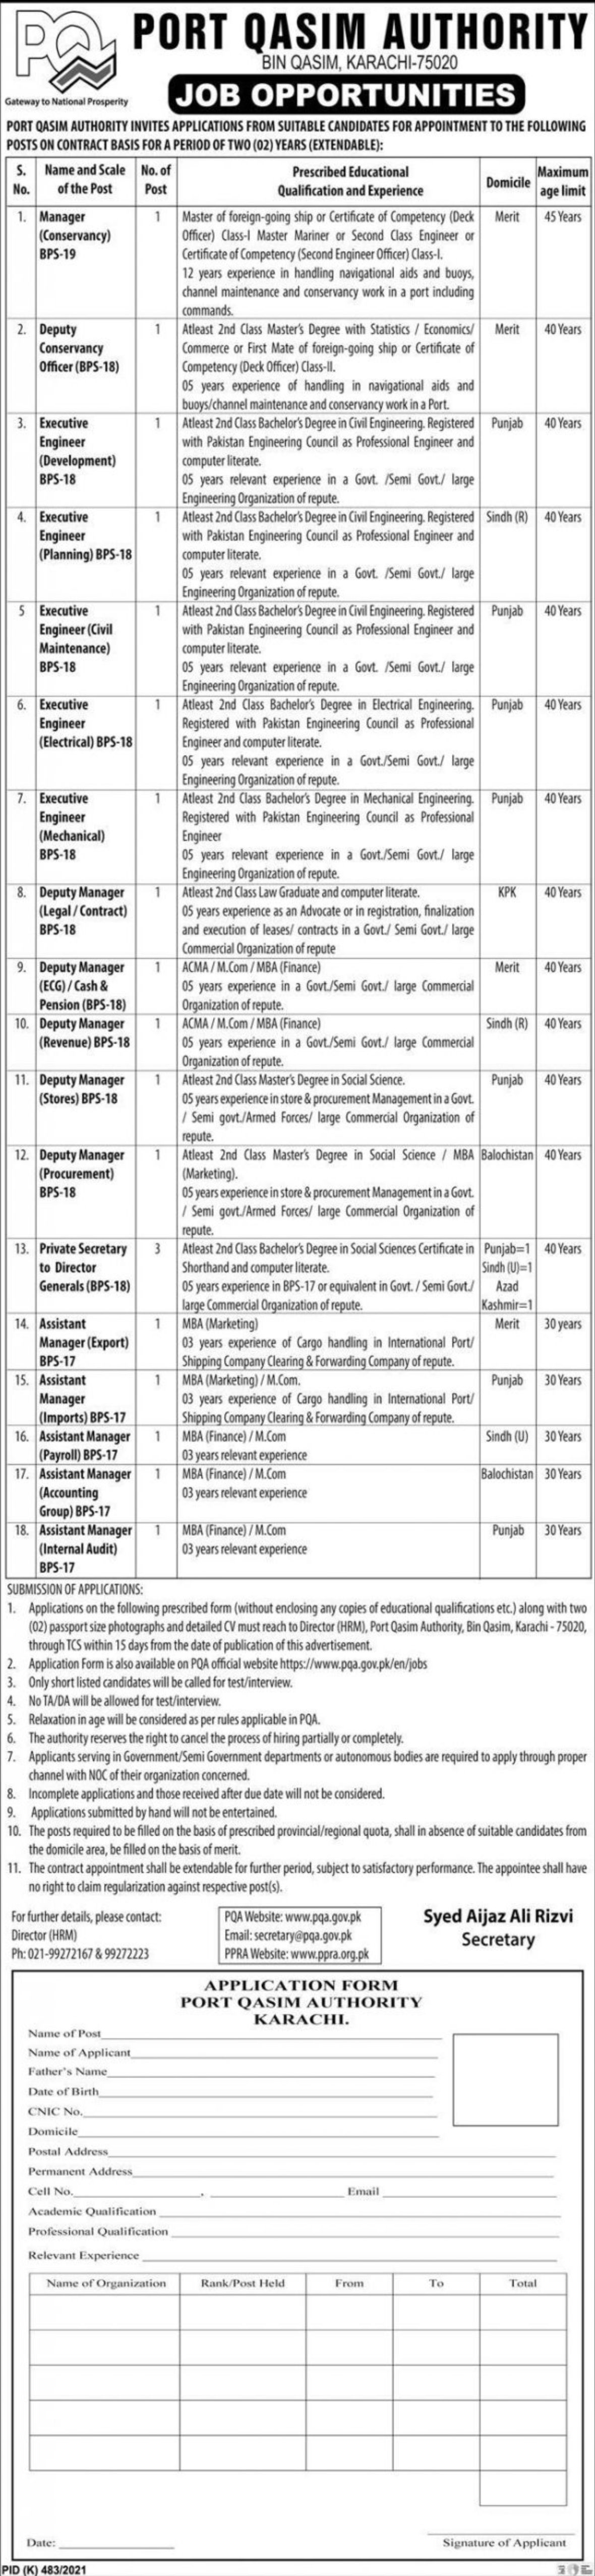 Port Qasim Authority PQA Vacancies 2021 2